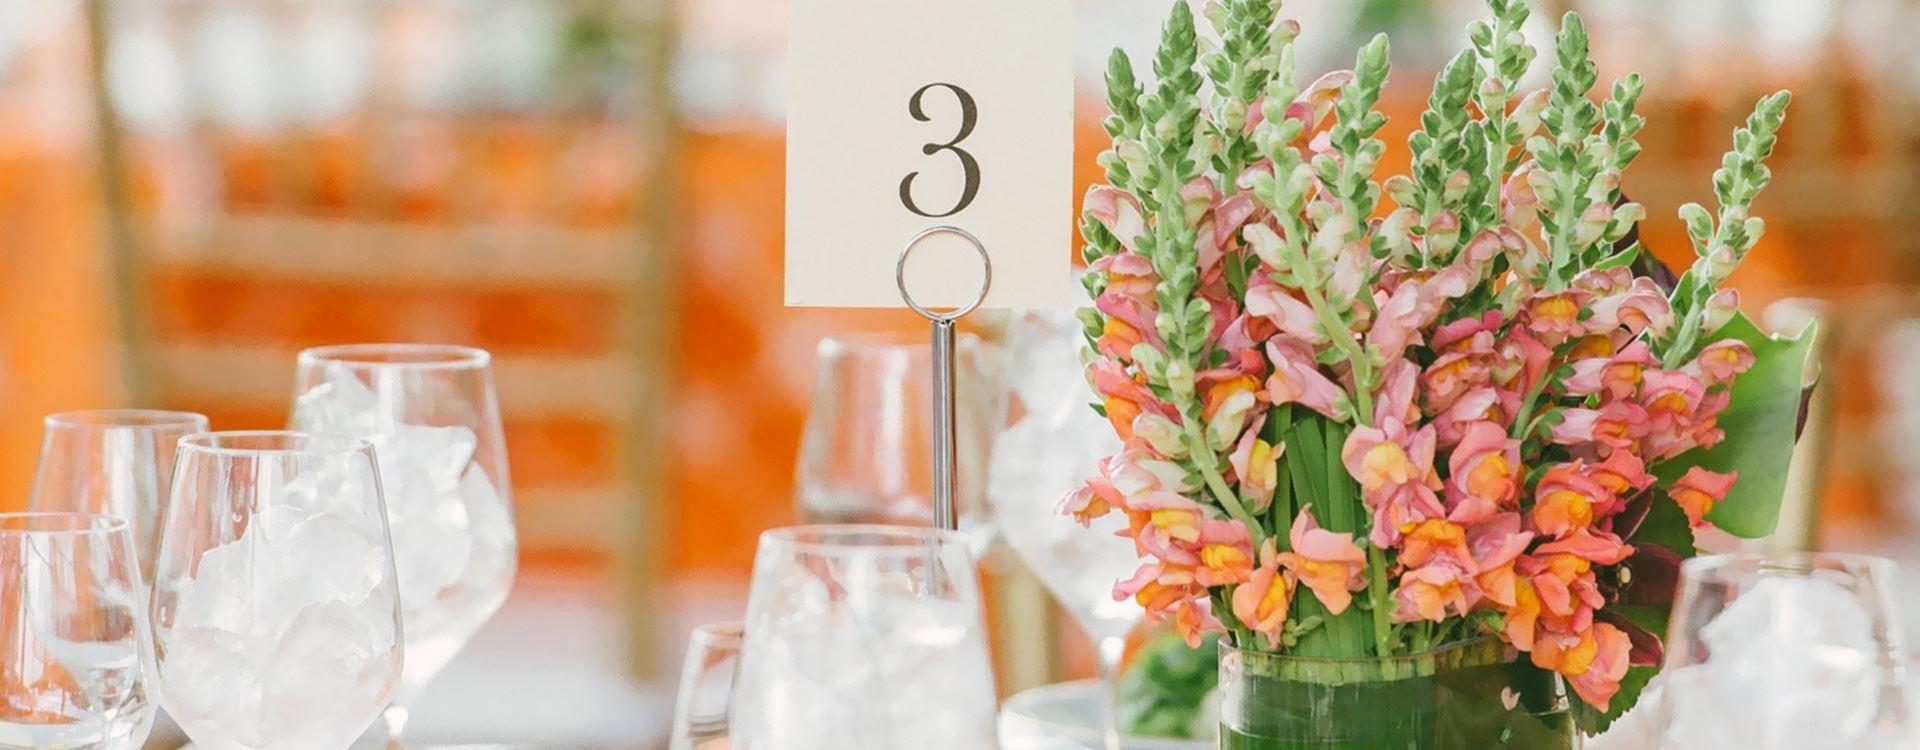 Plan Your Wedding in Hotel Scottsdale